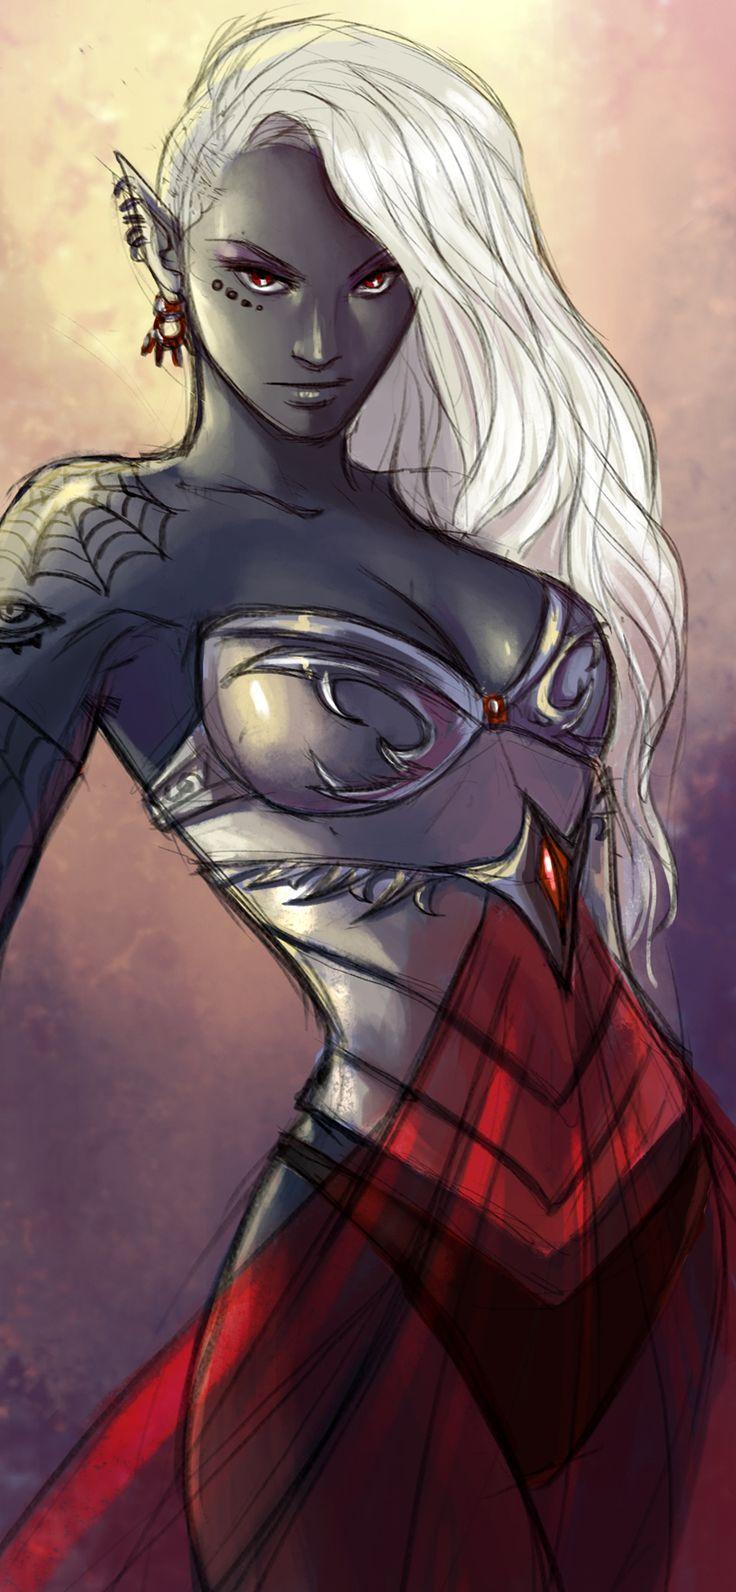 Empress by iara-art.deviantart.com on @DeviantArt